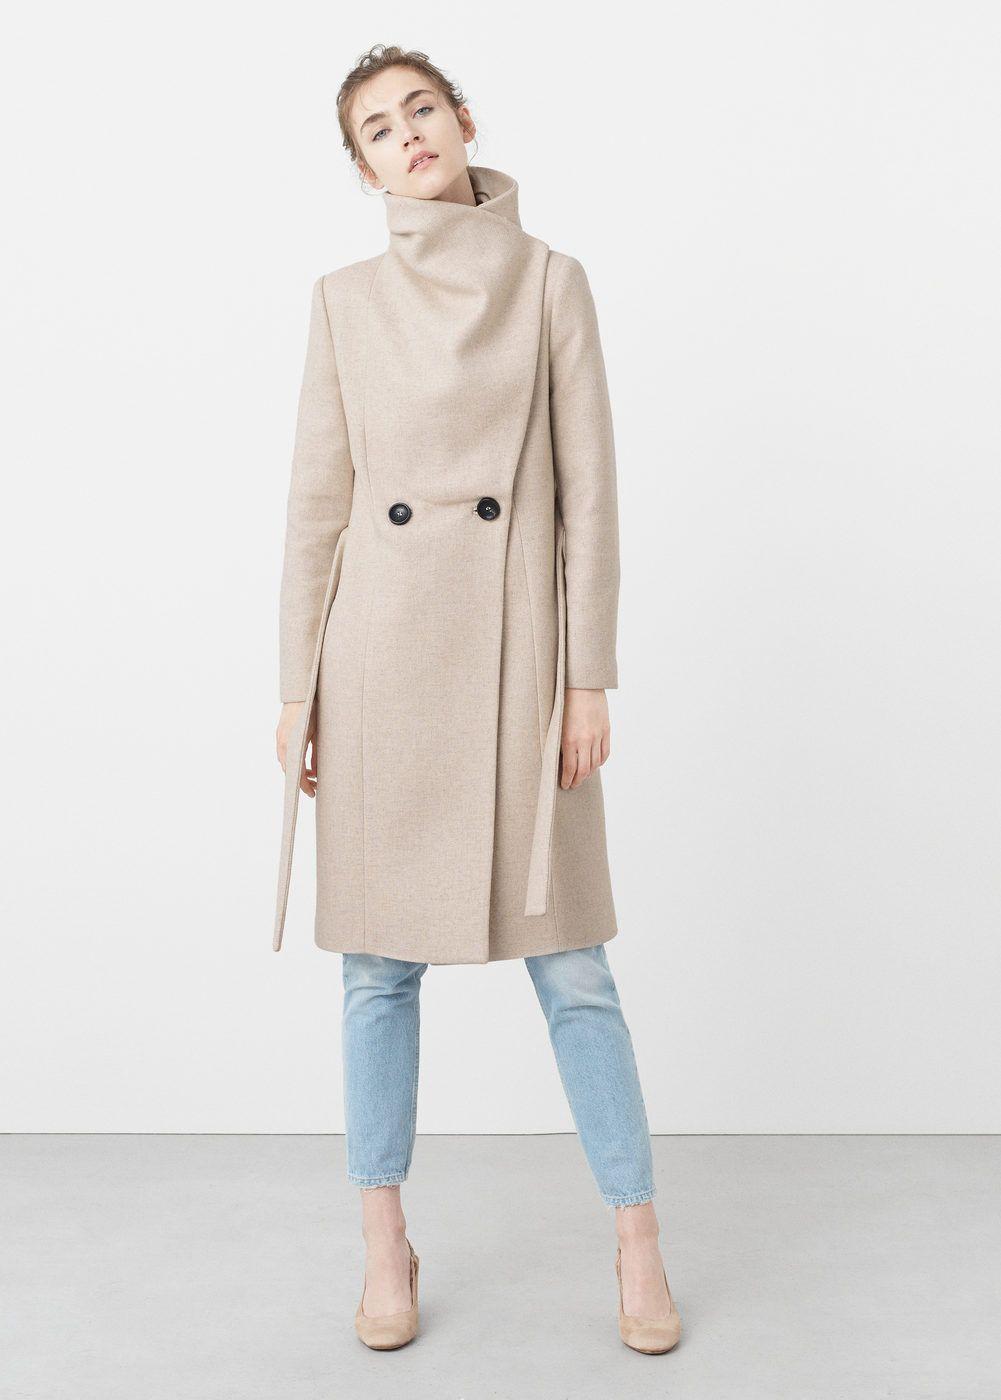 Wollmantel mit breitem revers - Damen. Wide lapel wool-blend coat   MANGO 111459c7c025